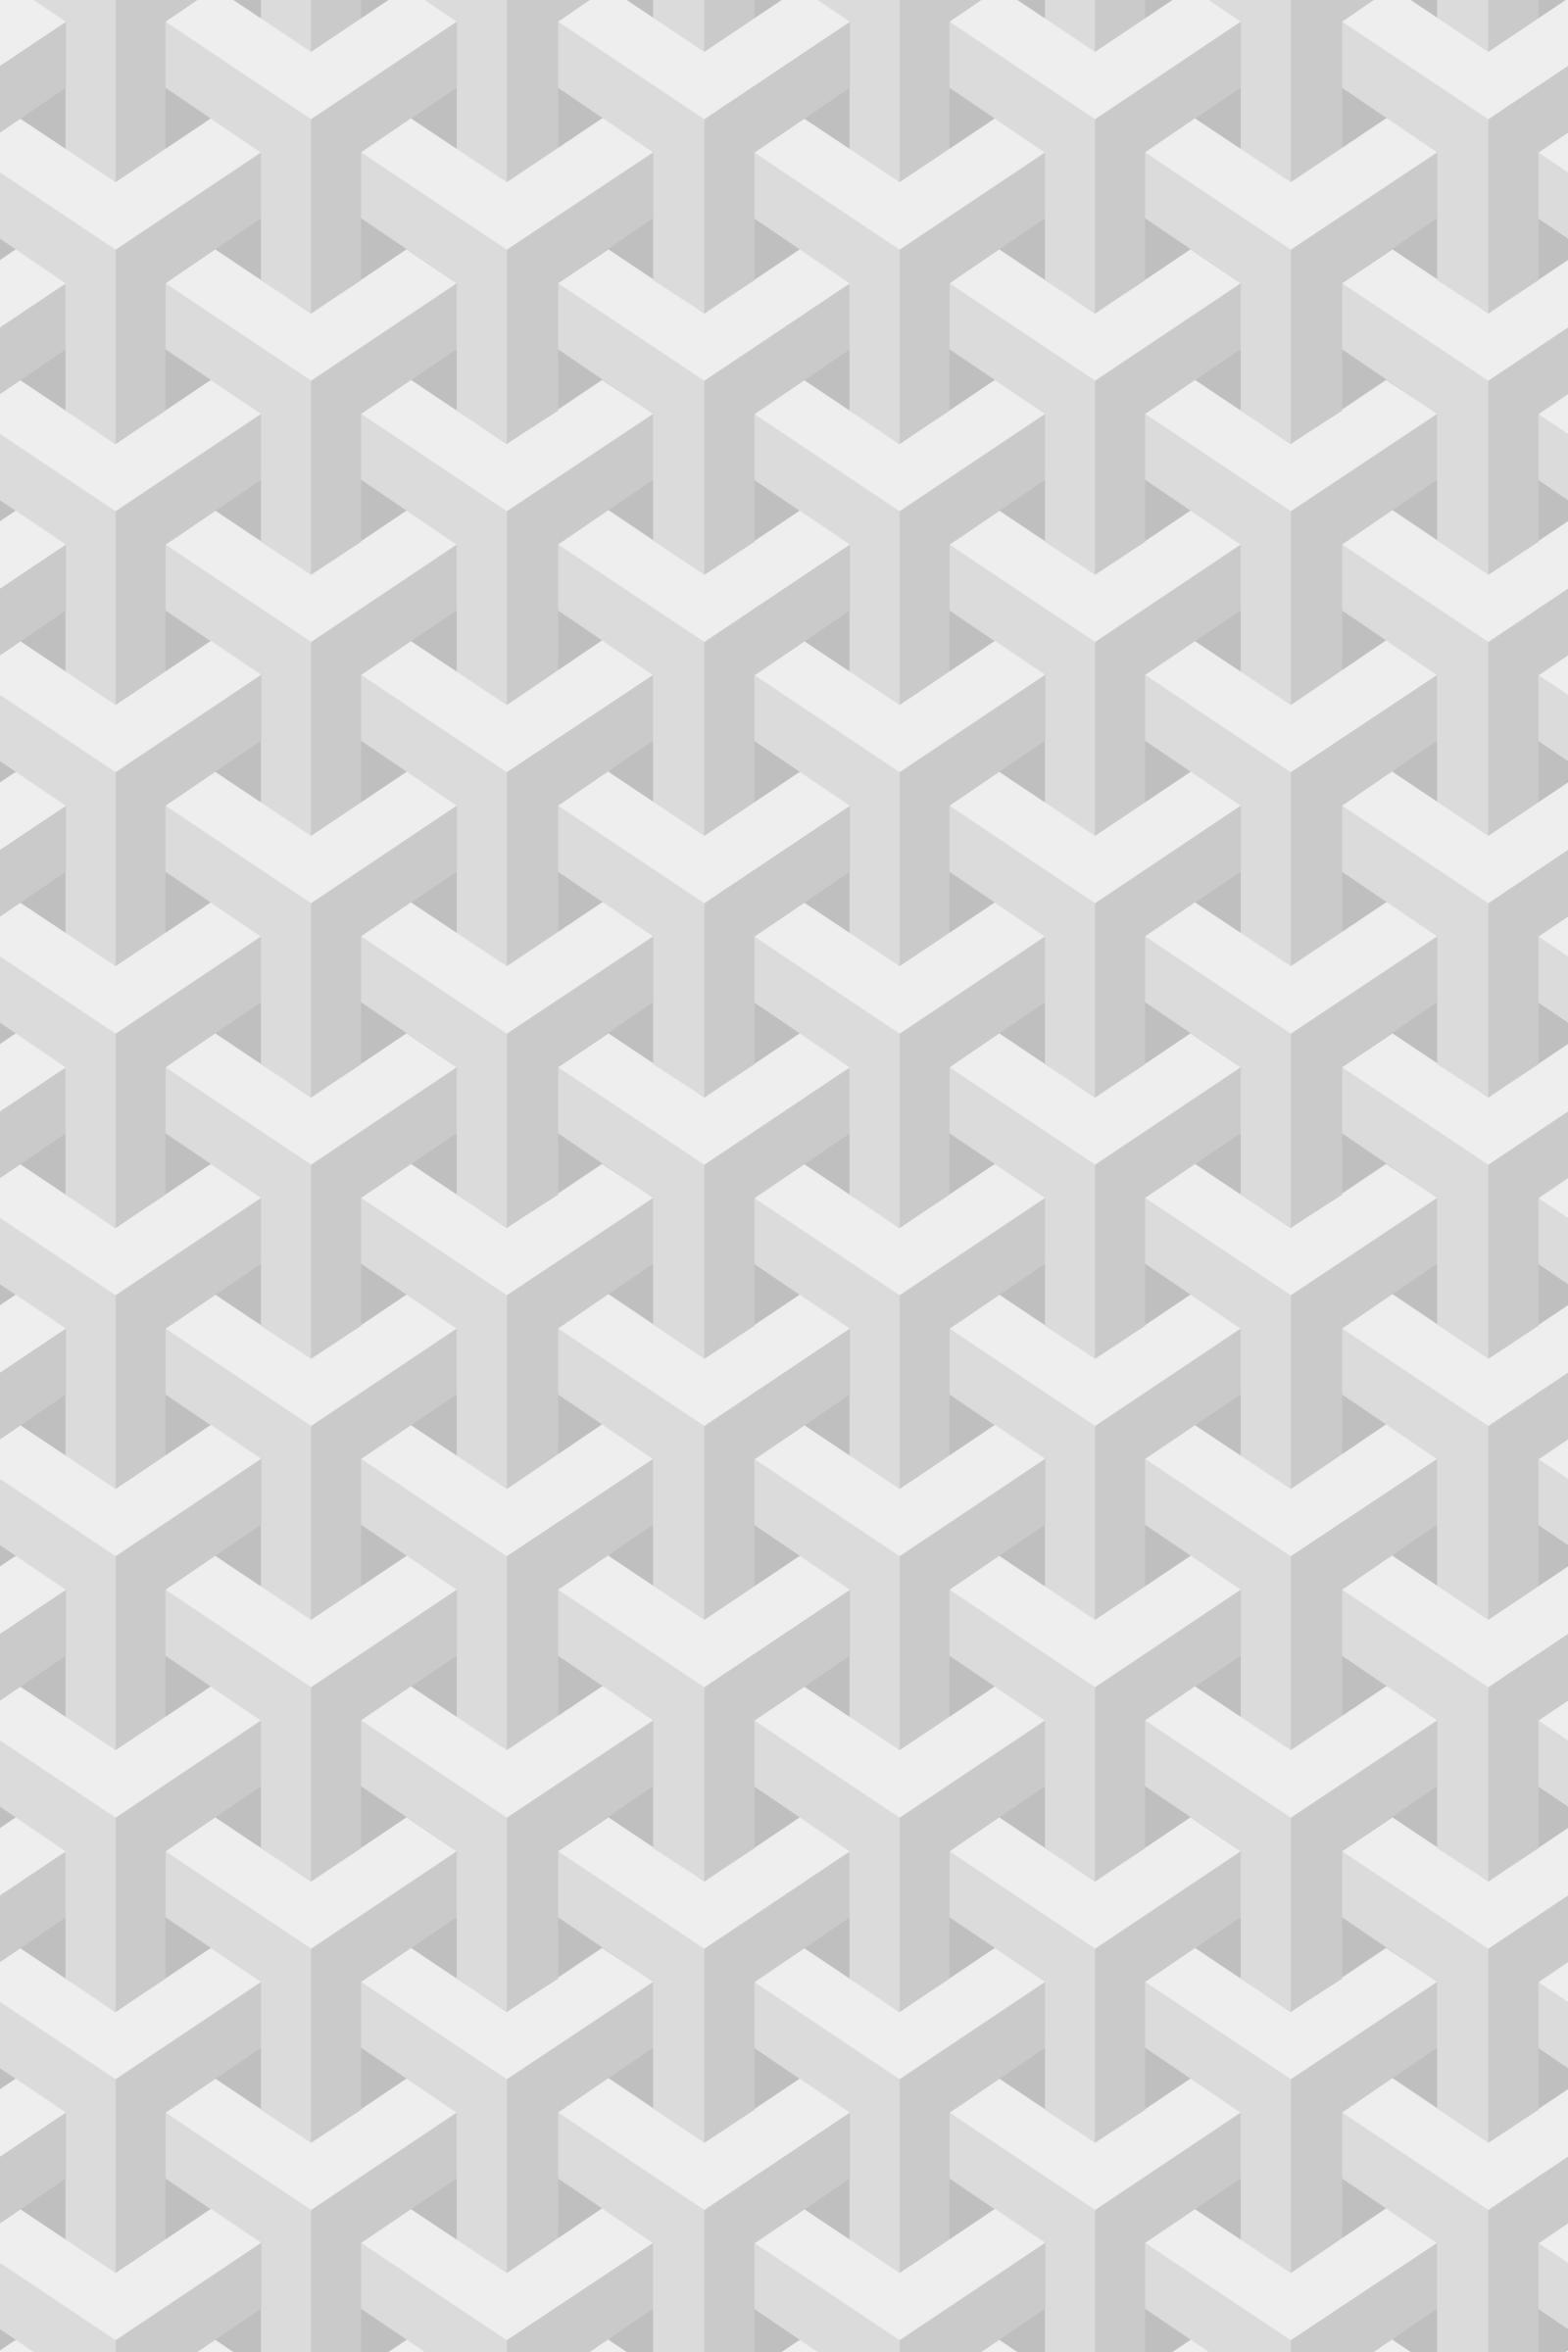 Escher inspired stacking cubes subtle white seamless pattern wallpaper